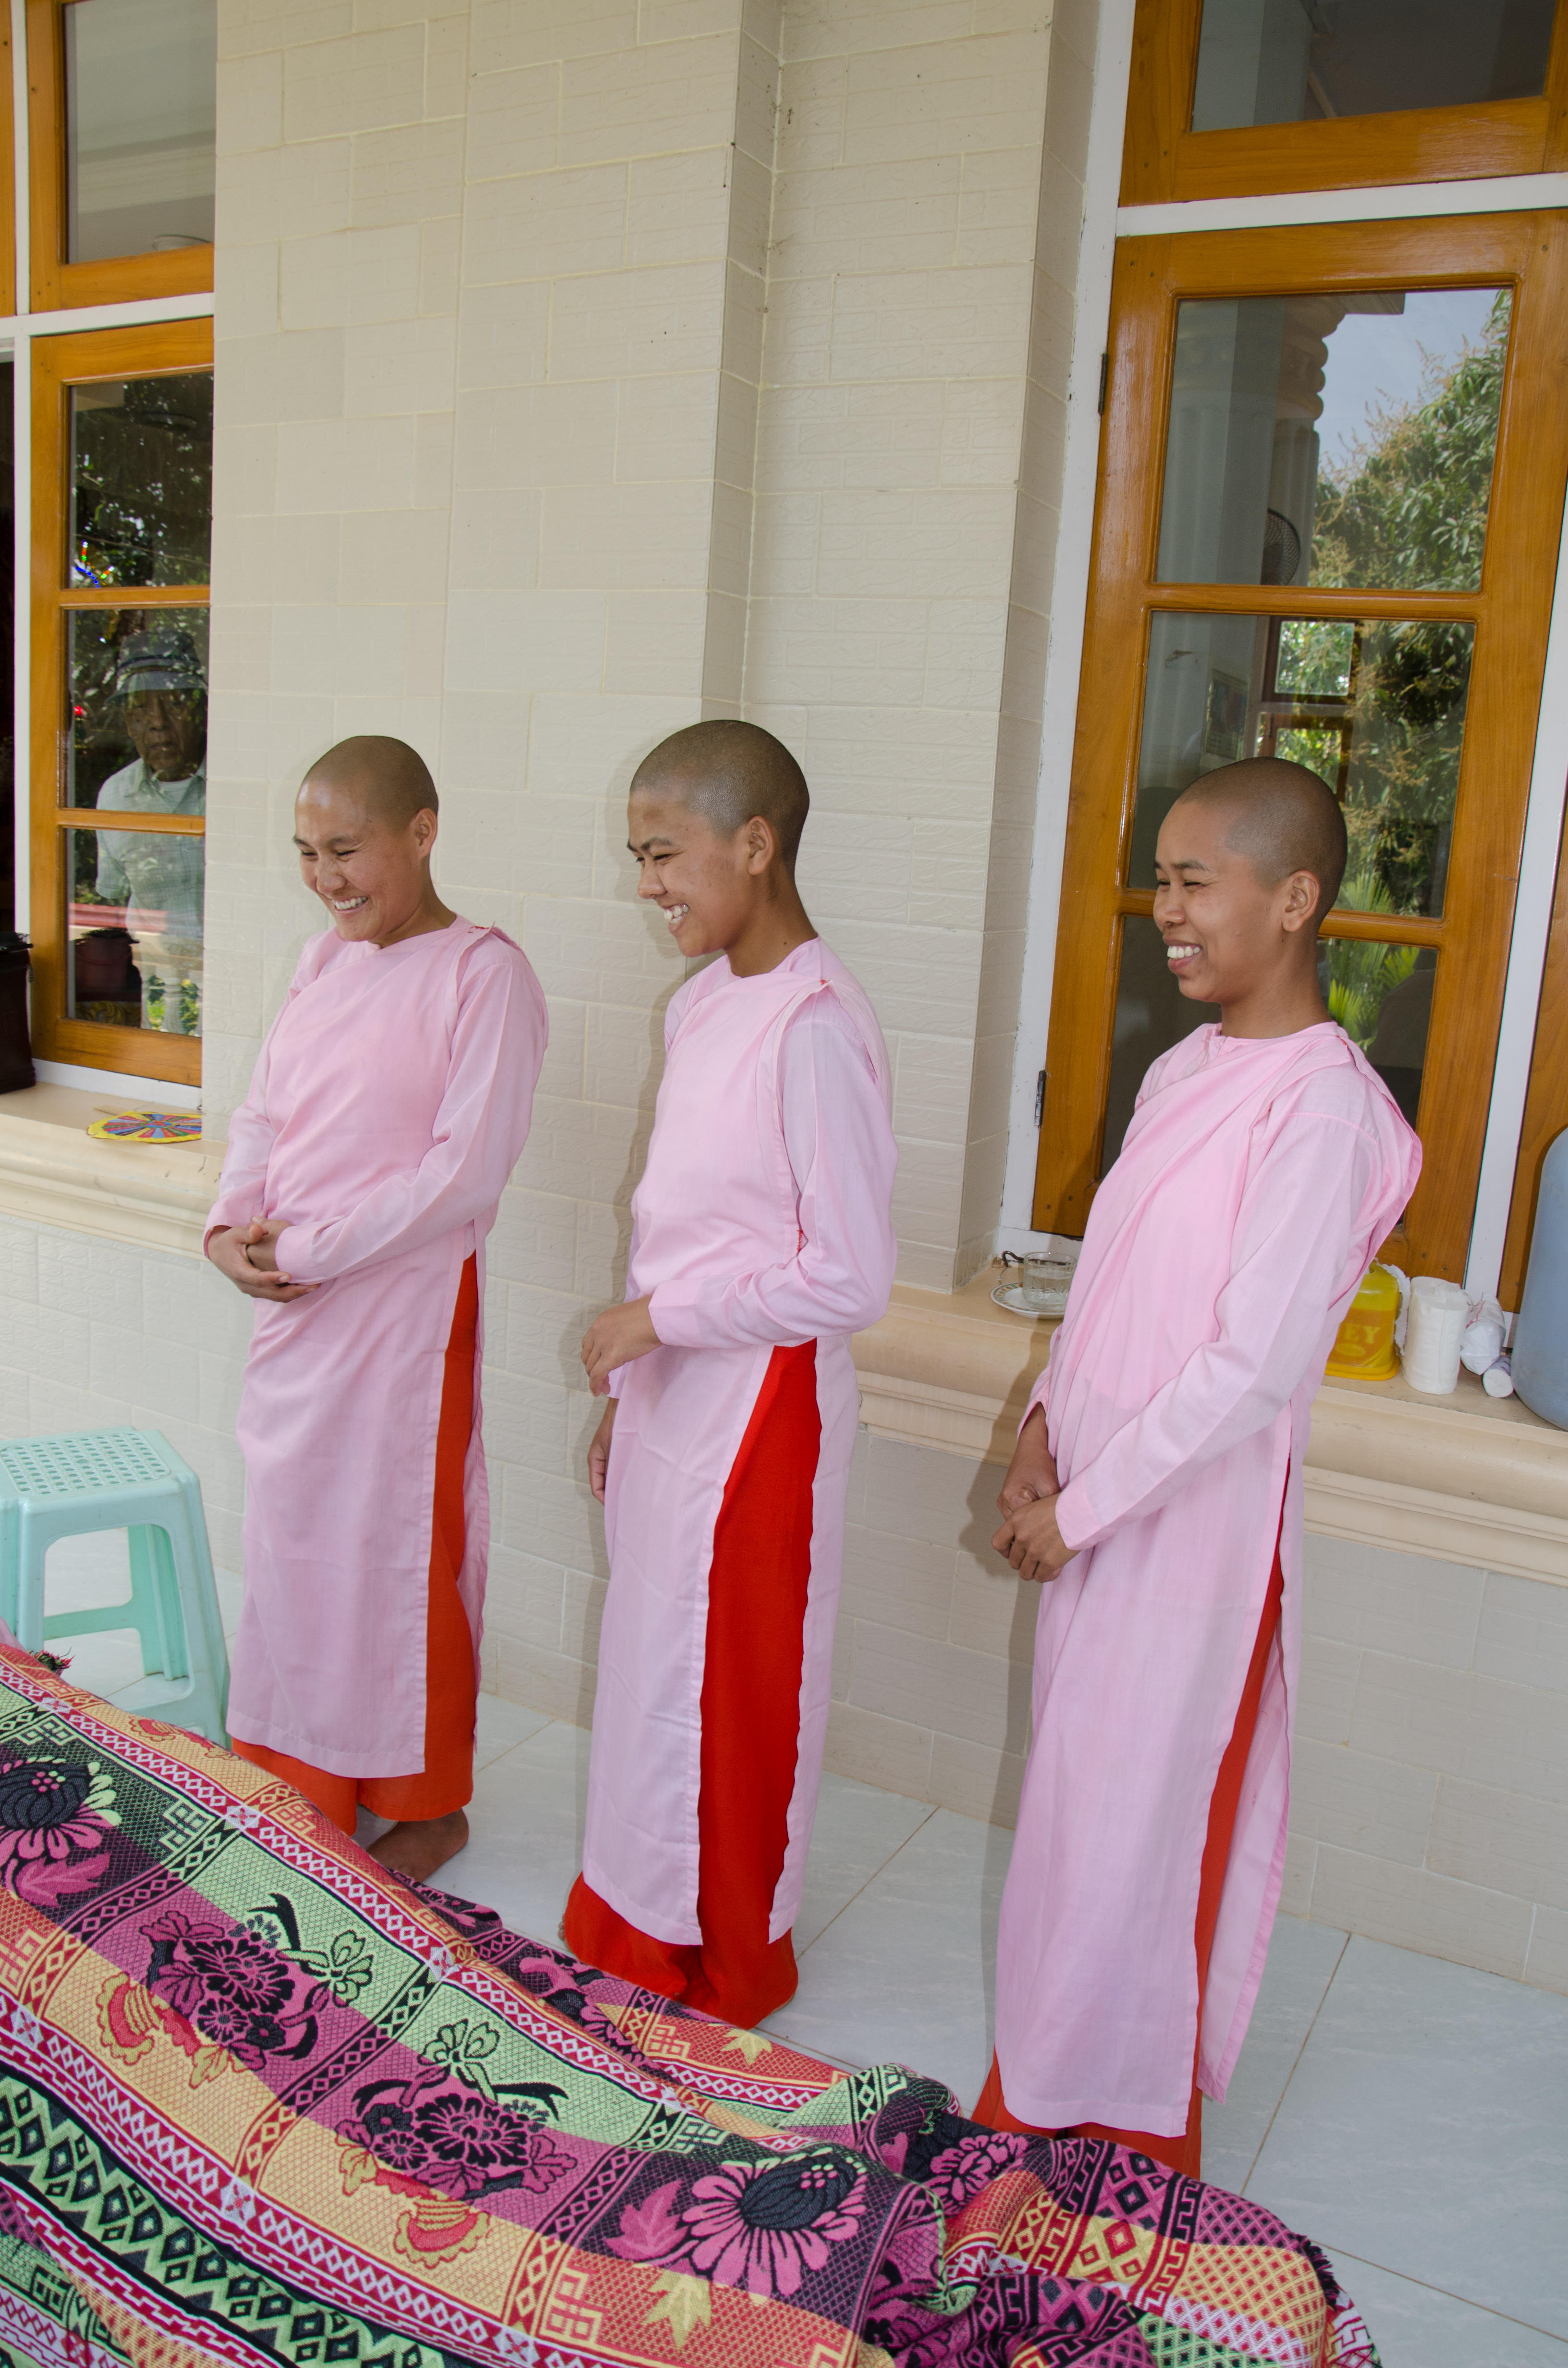 Nuns observing treatment